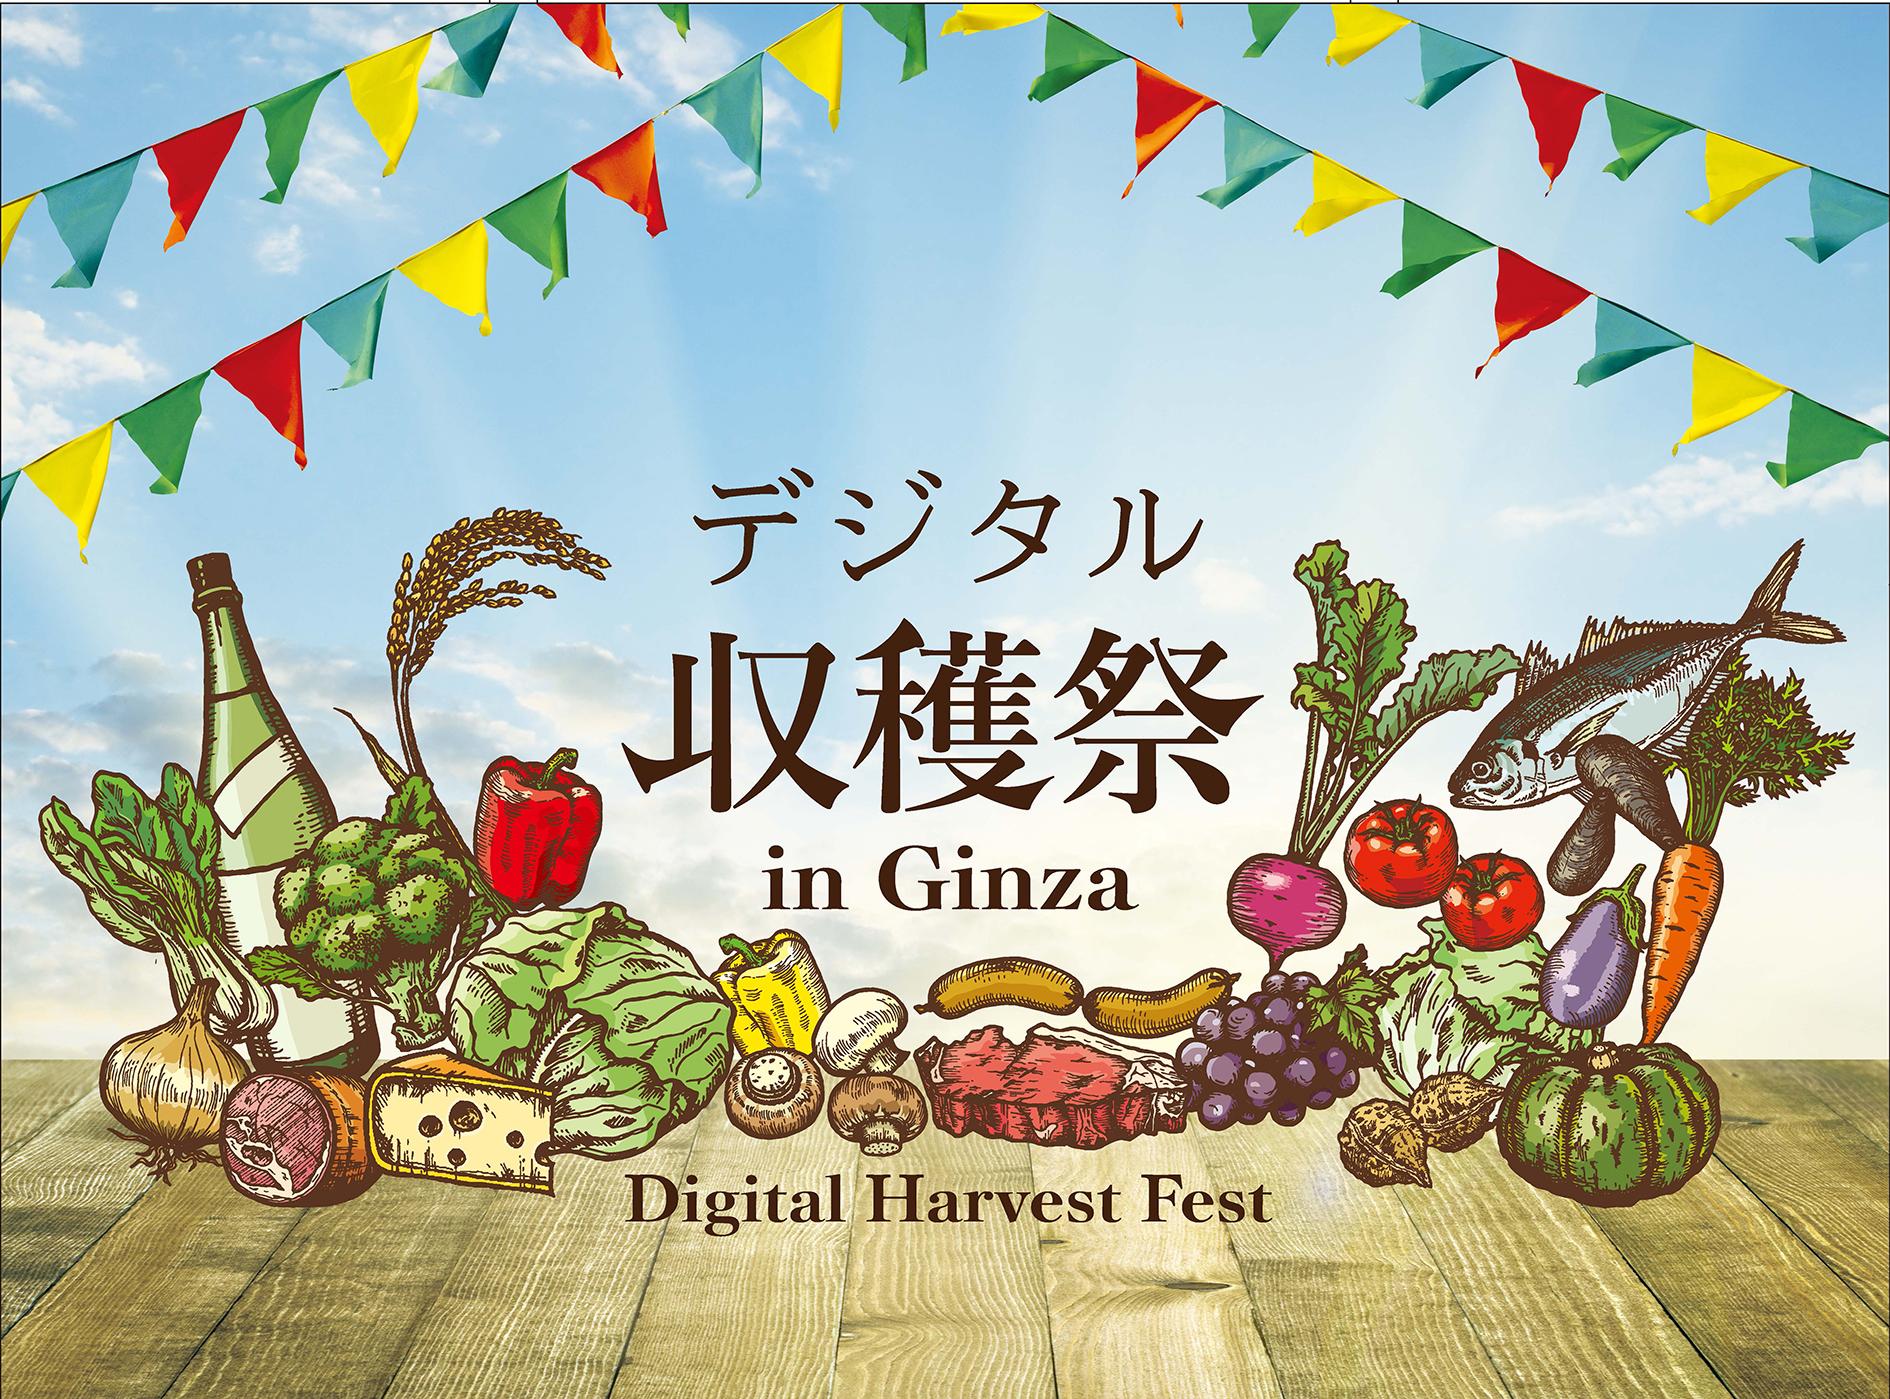 METoA GINZA展示会「デジタル収穫祭 in Ginza」に関するお知らせ